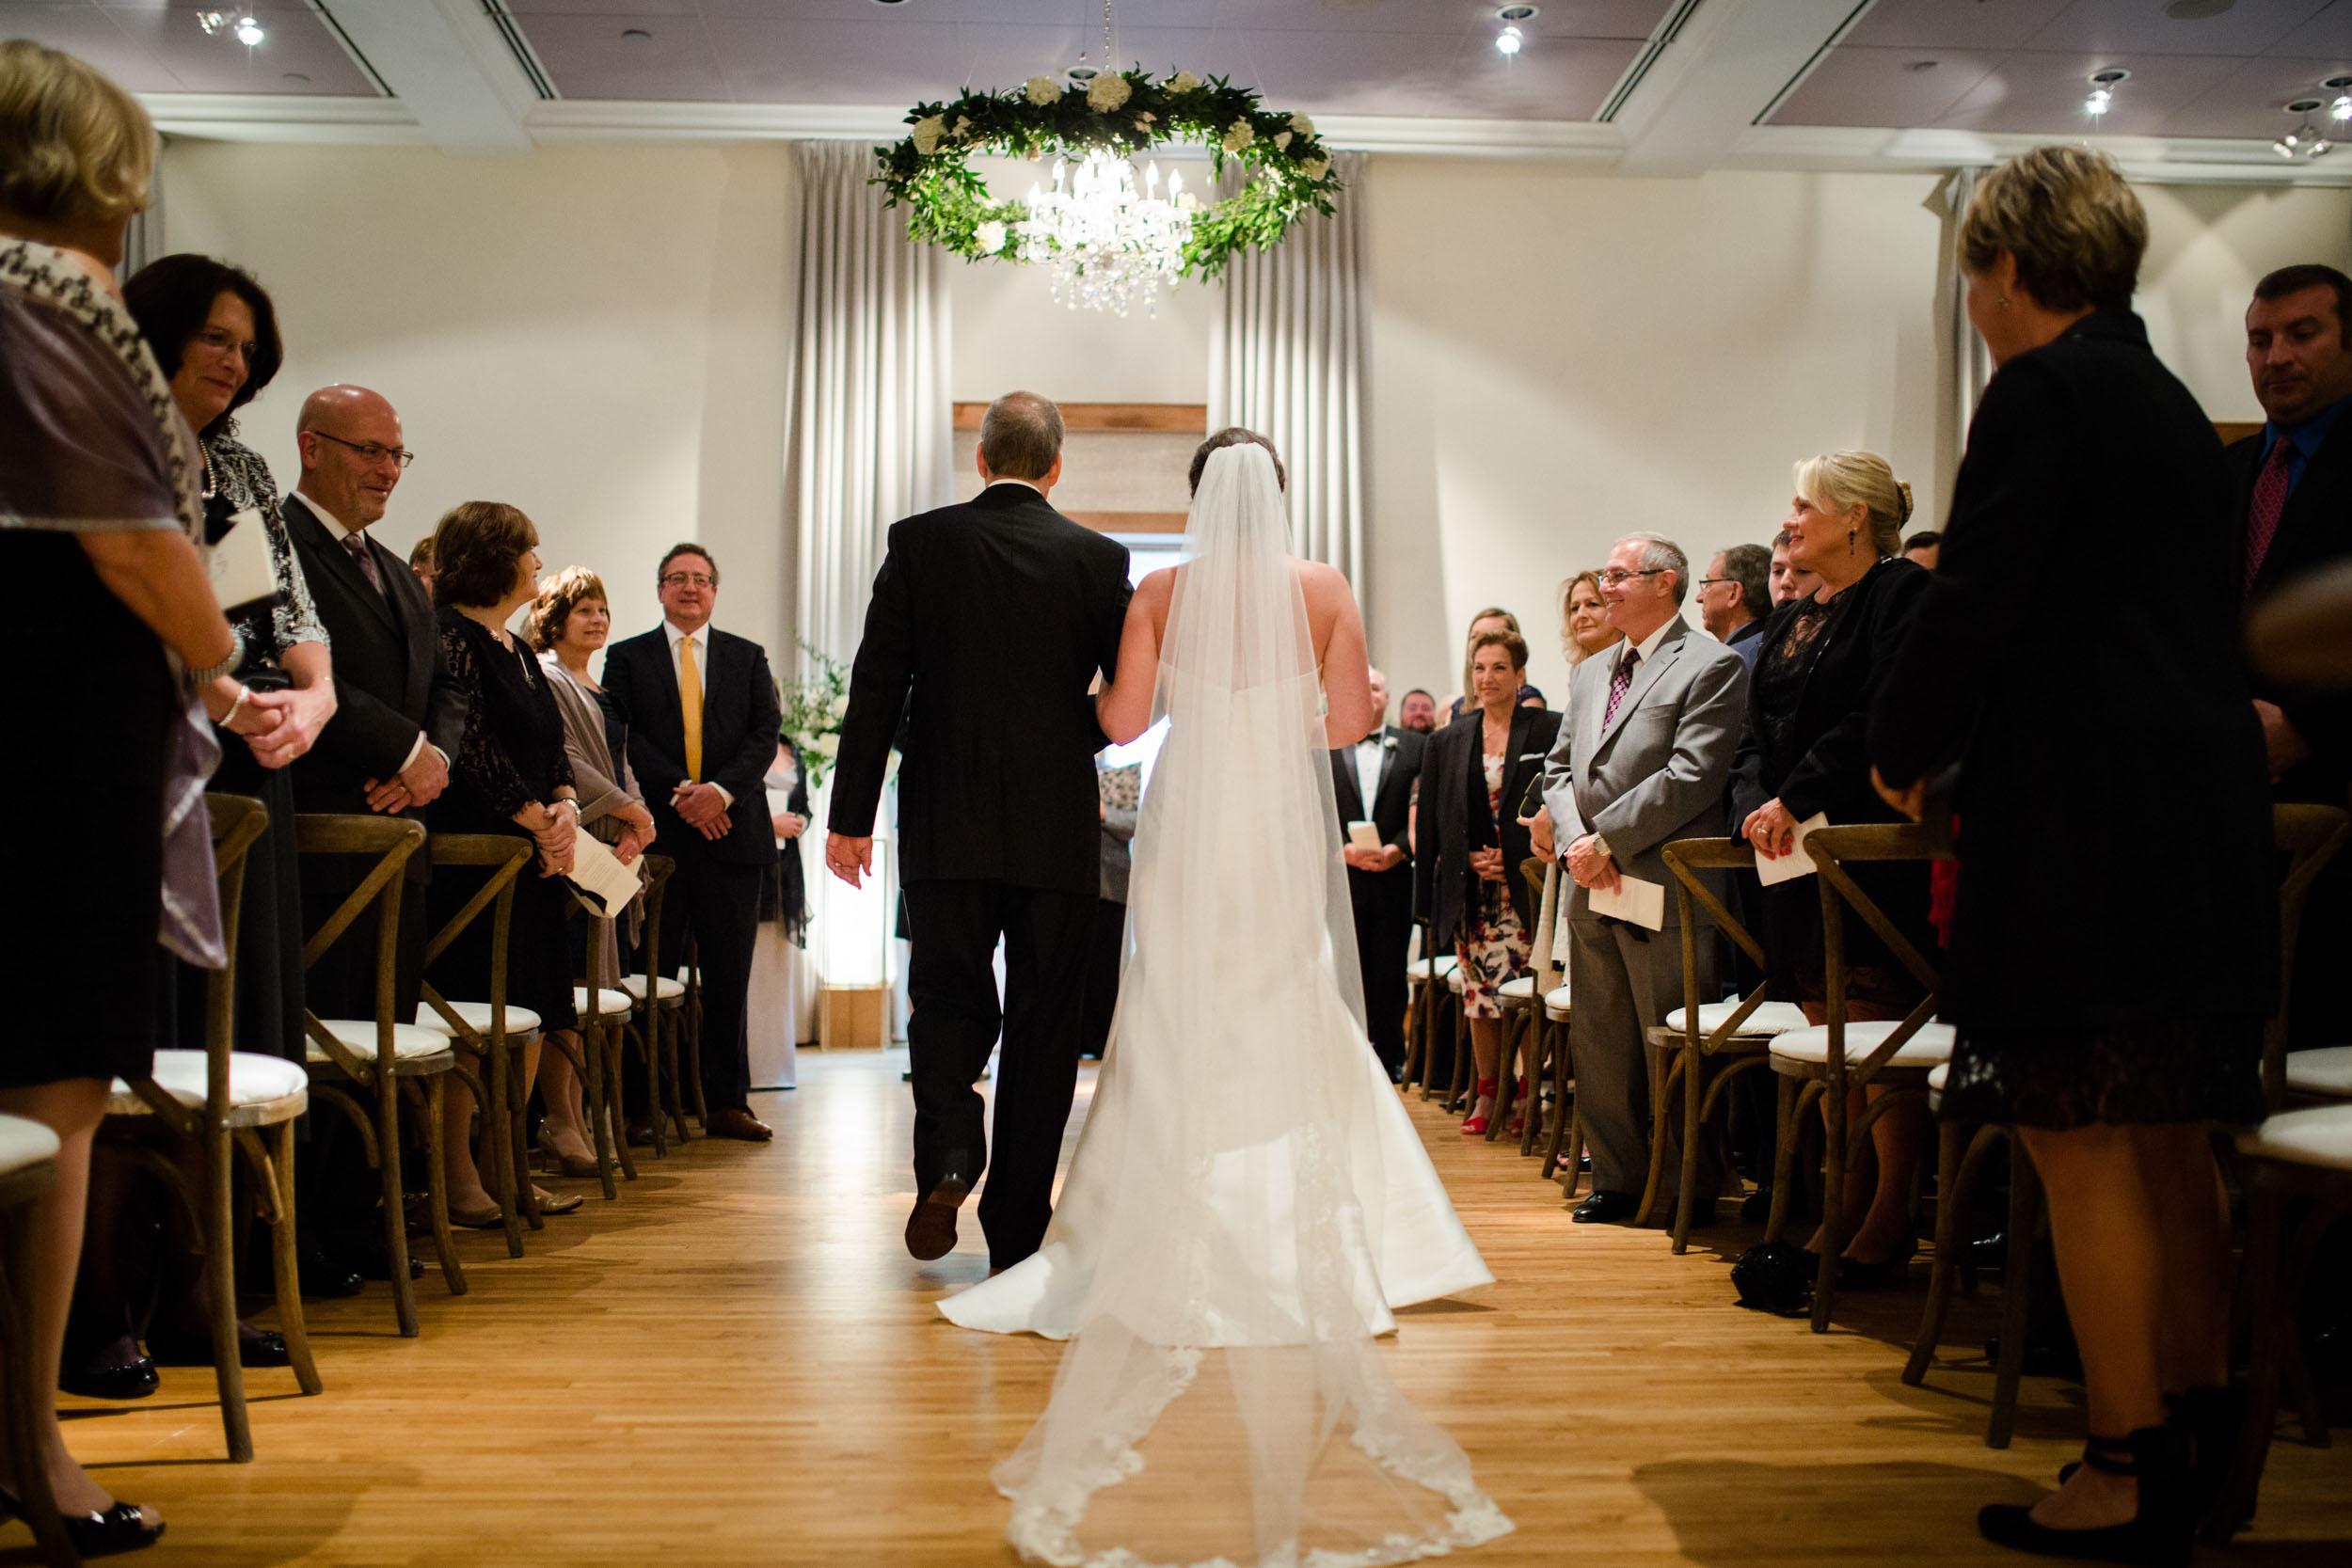 Wedding ceremony at Ivy Room Chicago.